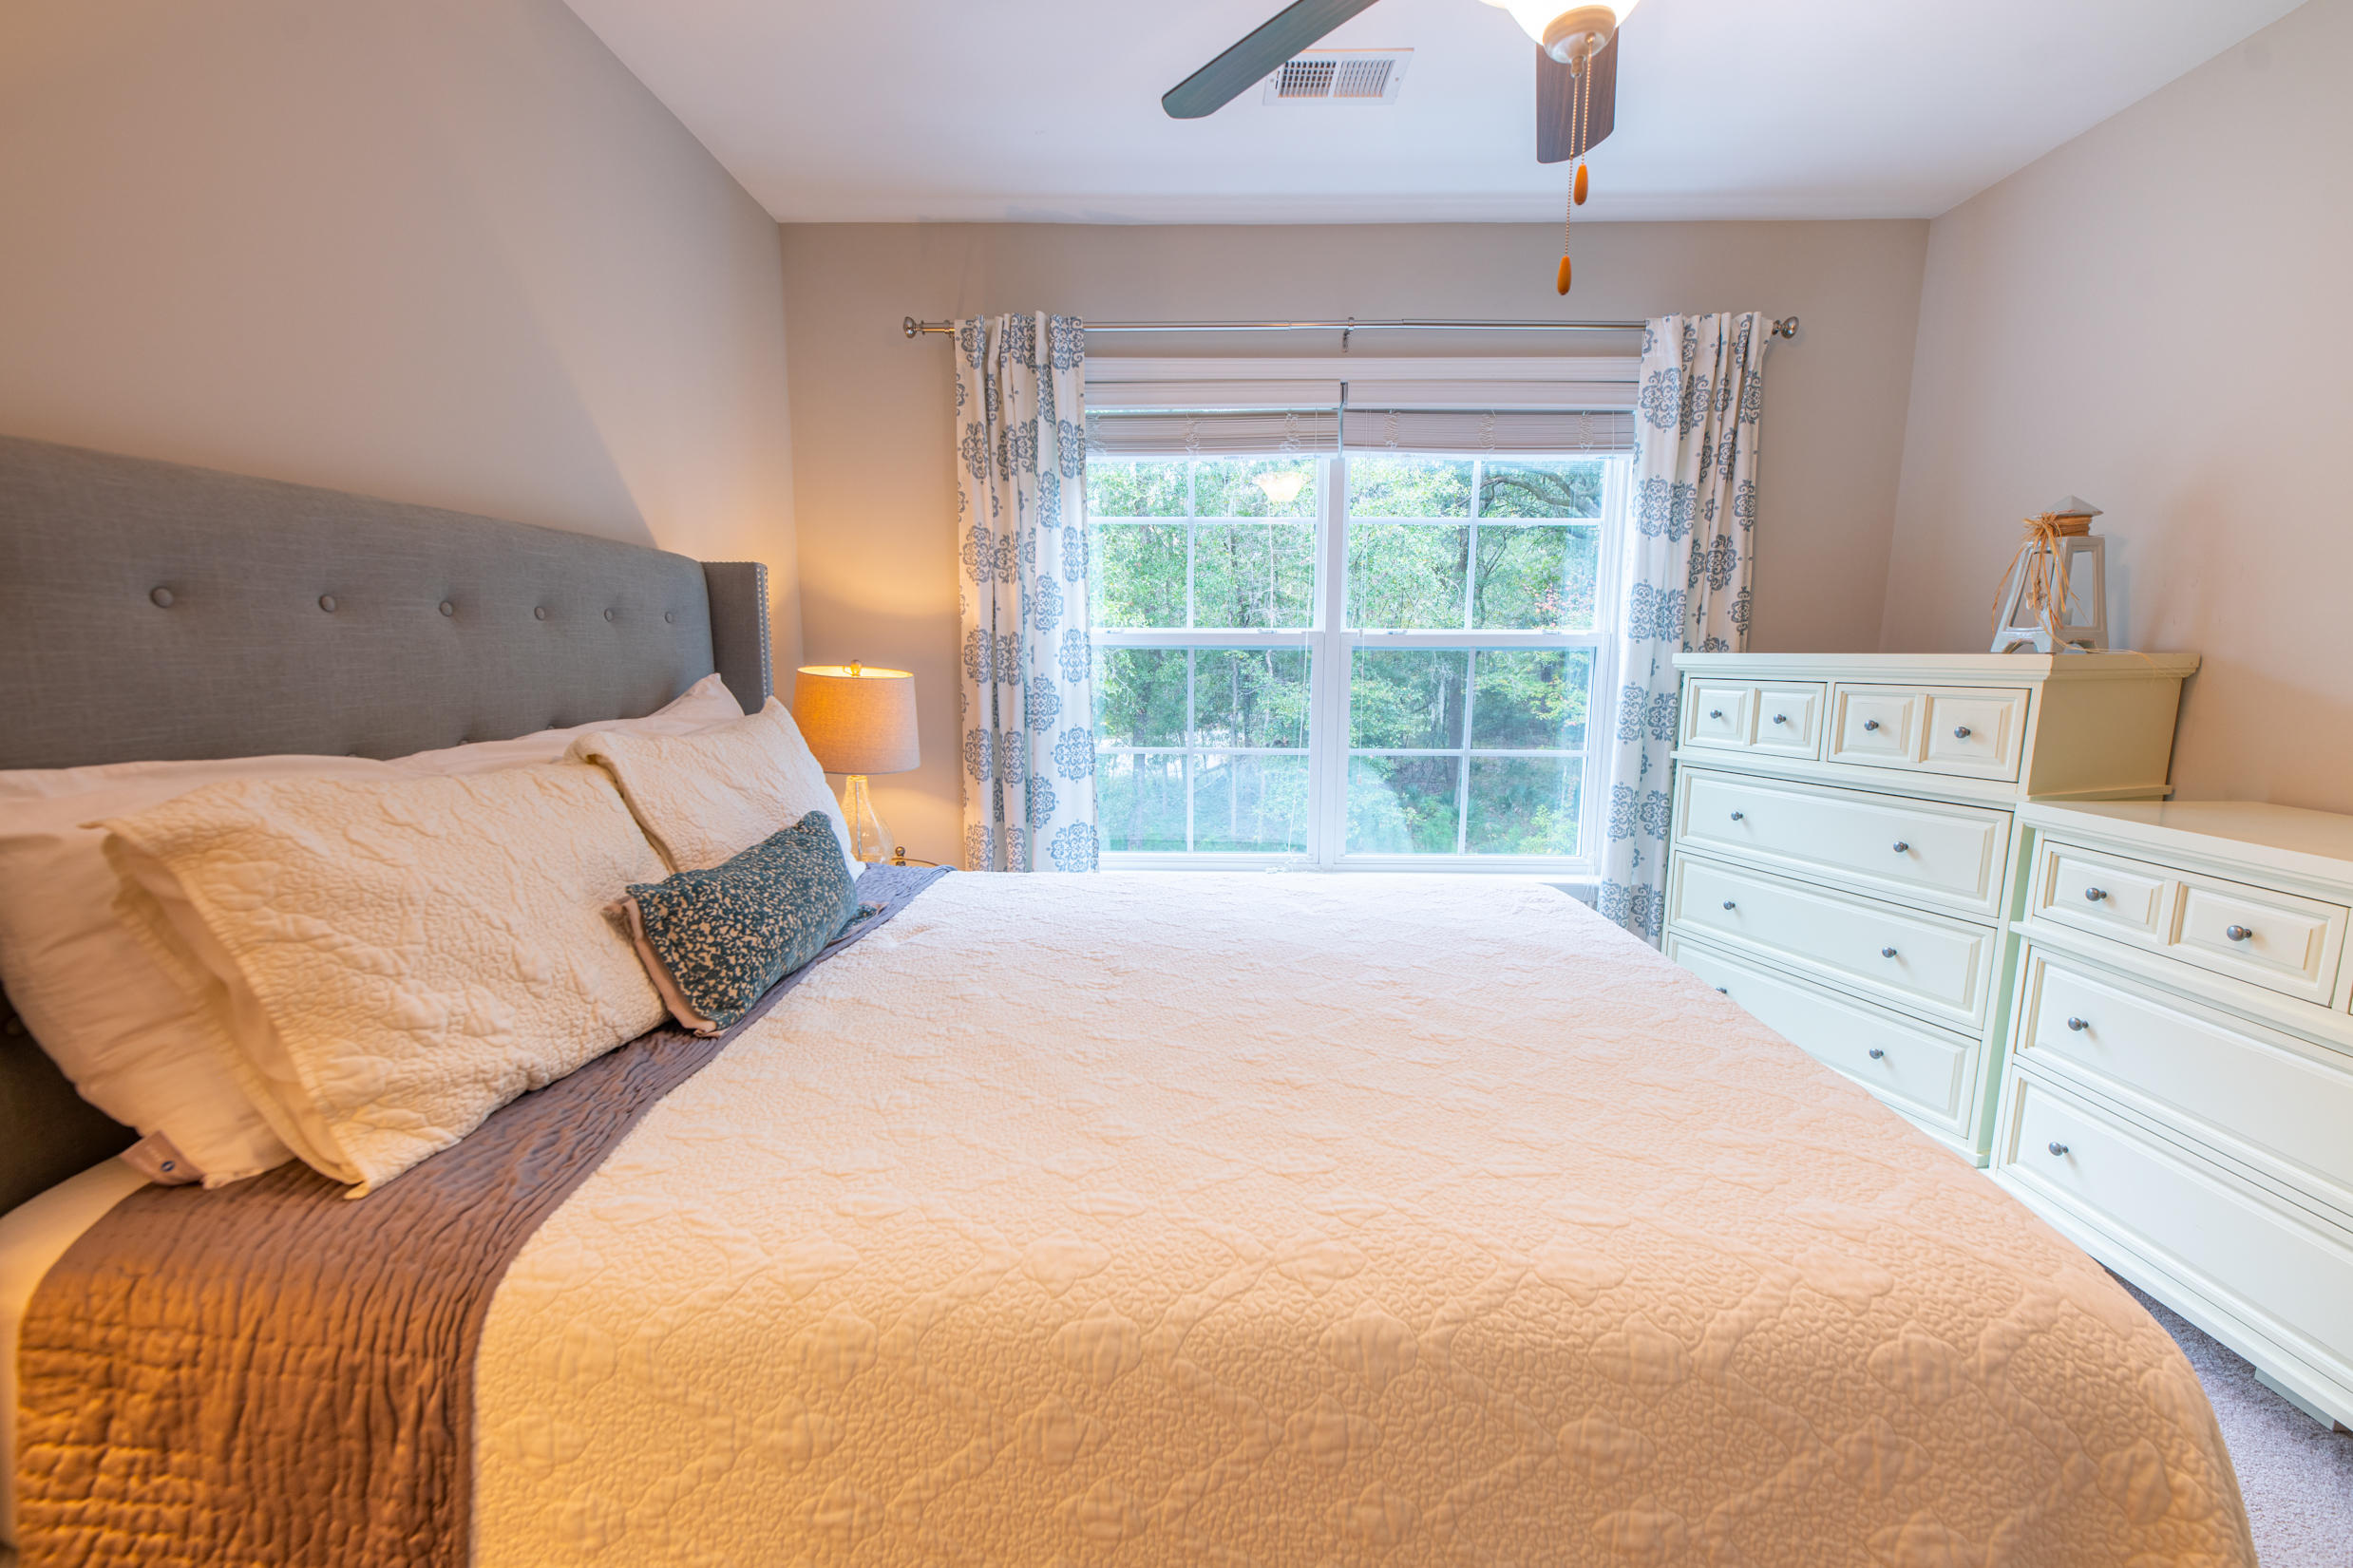 Waterloo Estates Homes For Sale - 2226 Arthur Rose, Johns Island, SC - 3